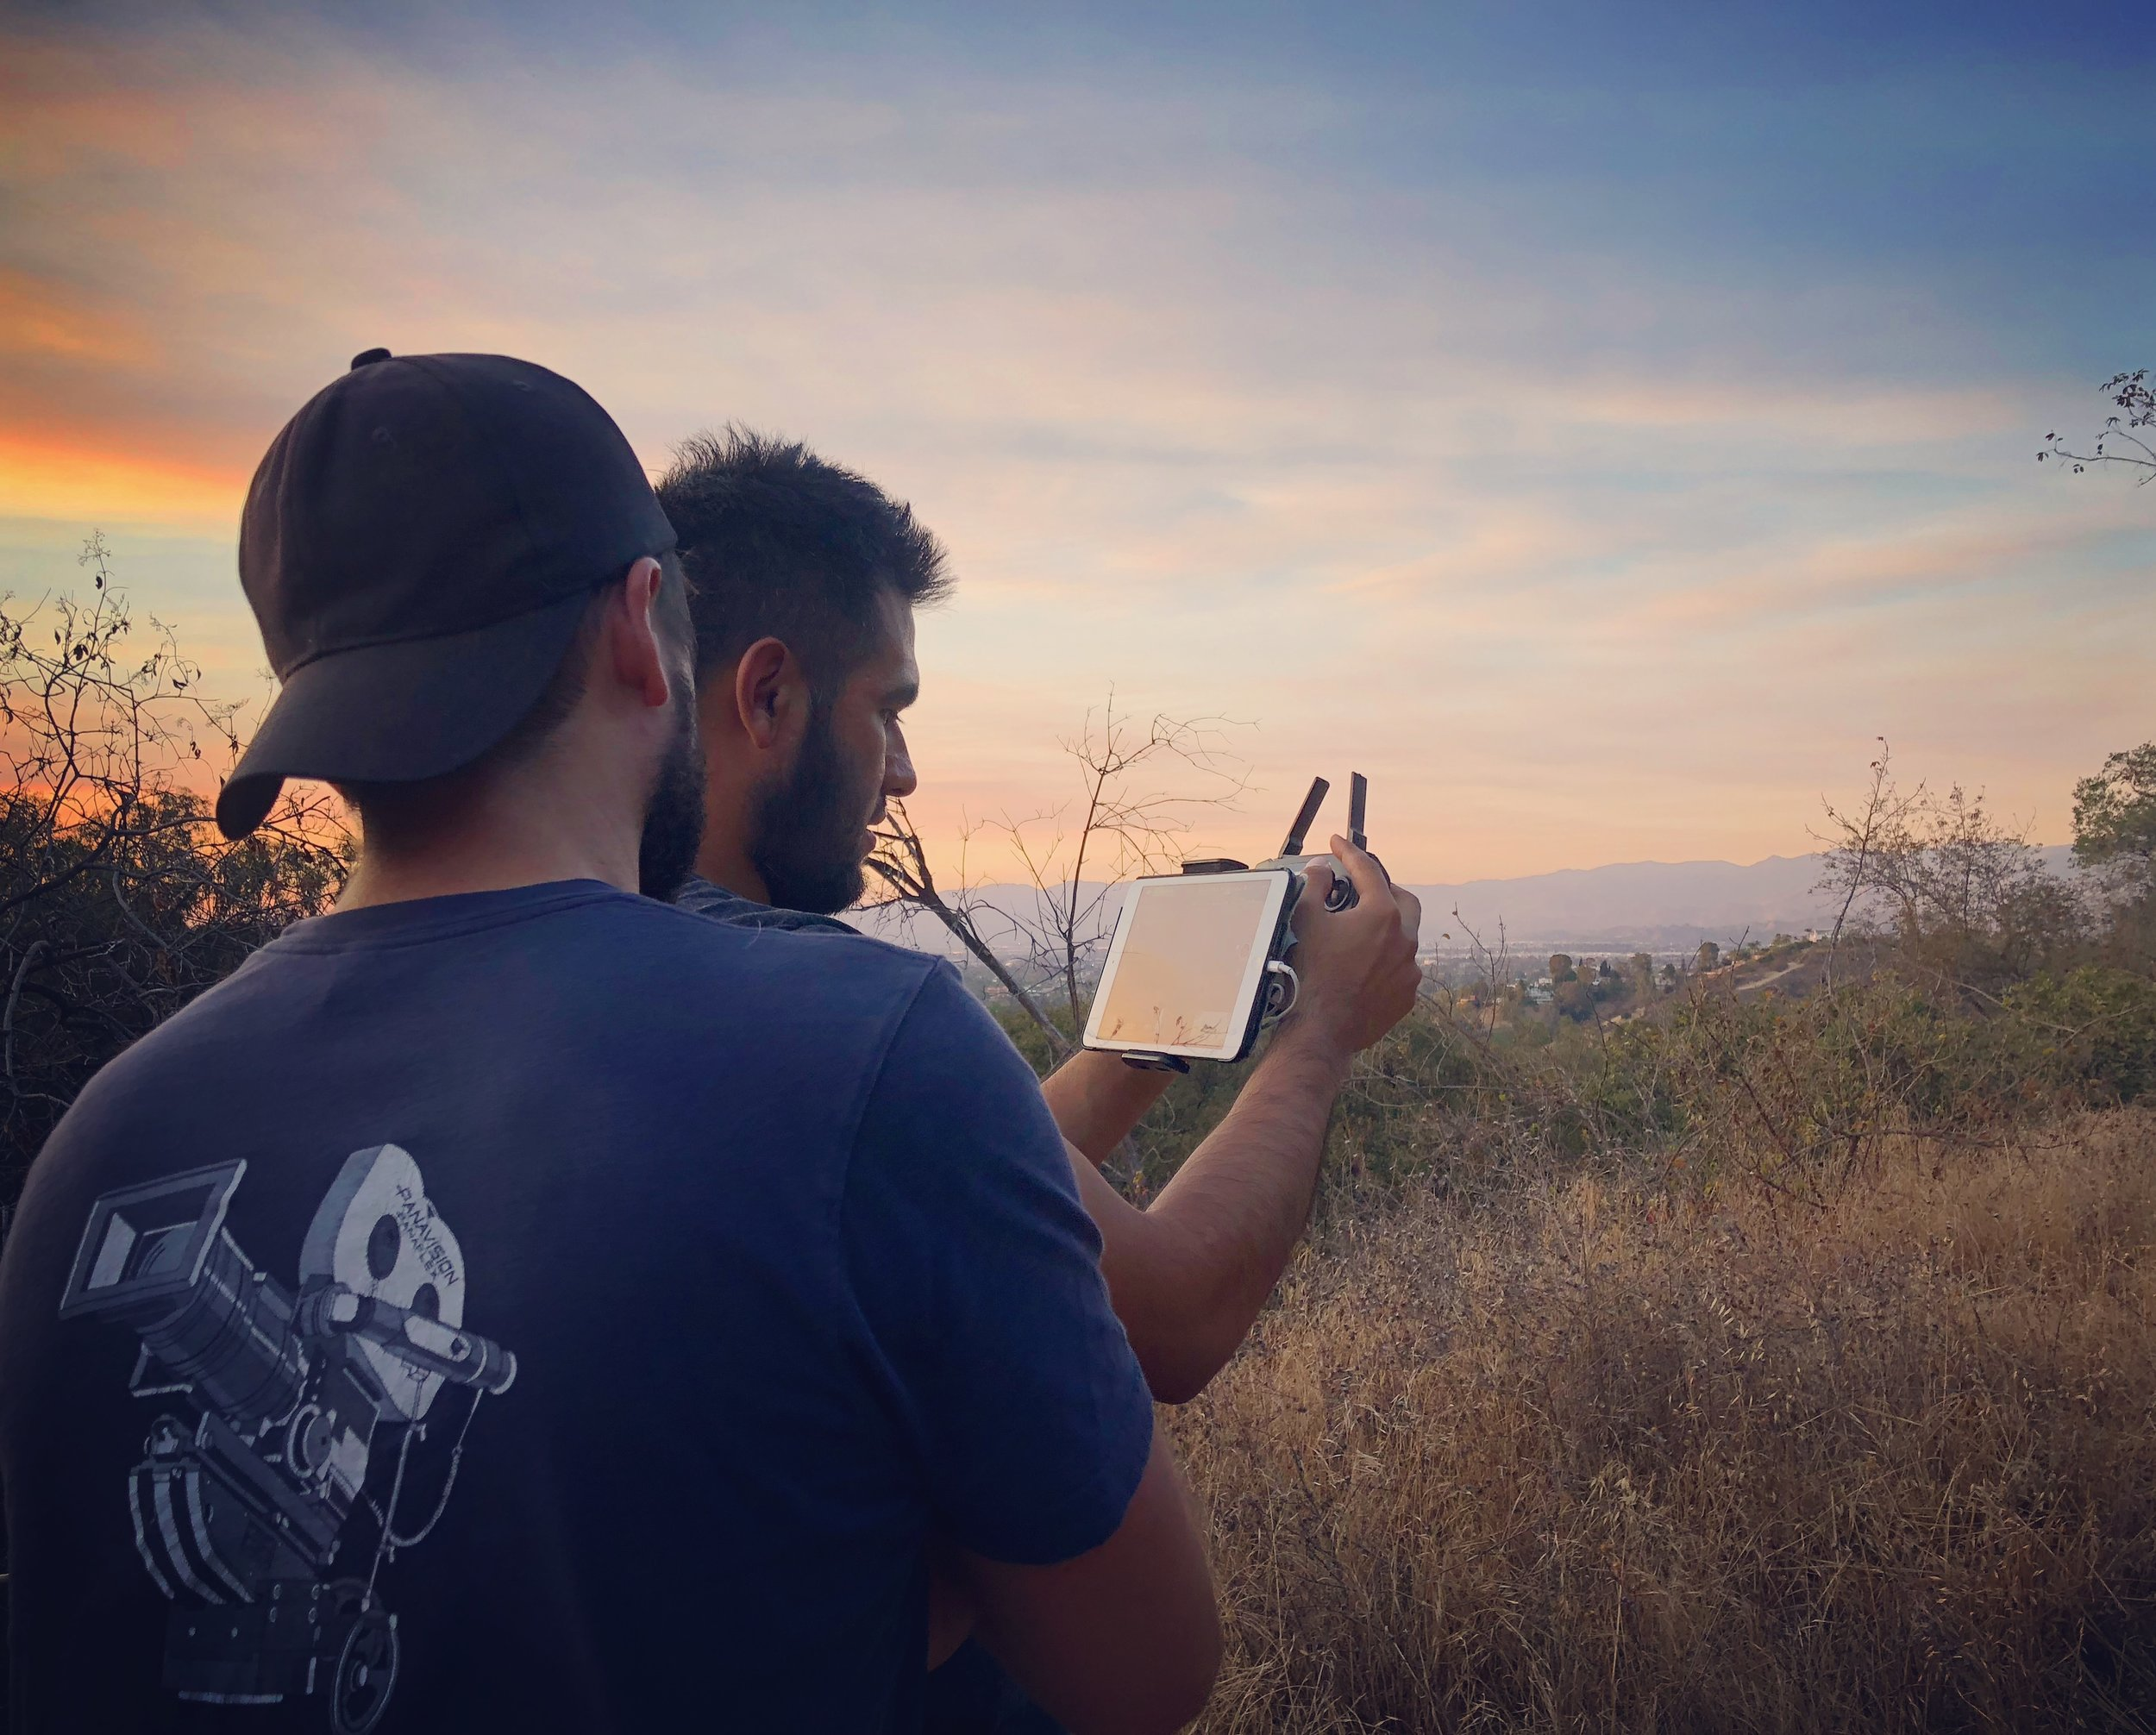 BTS with Jesse Aragon (DP) & Cameron Thrower (Dir.) capturing the drone shot.